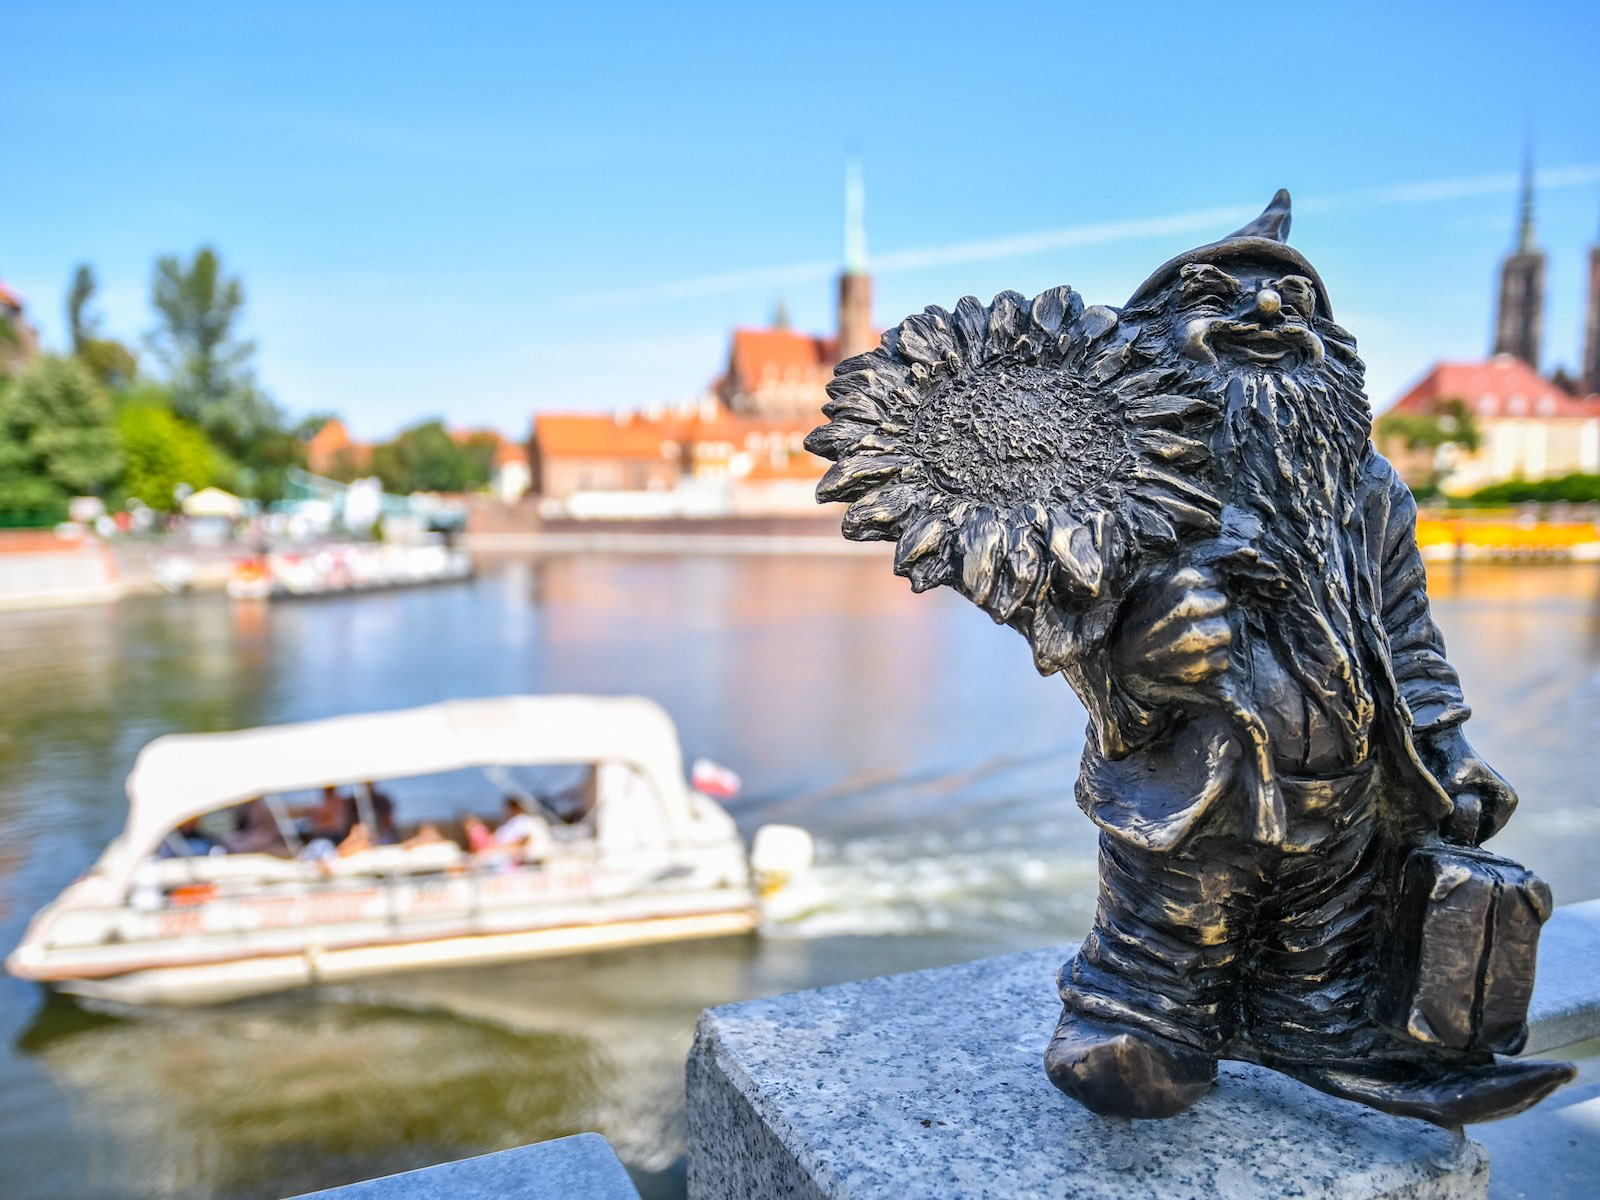 bezienswaardigheden in Wroclaw